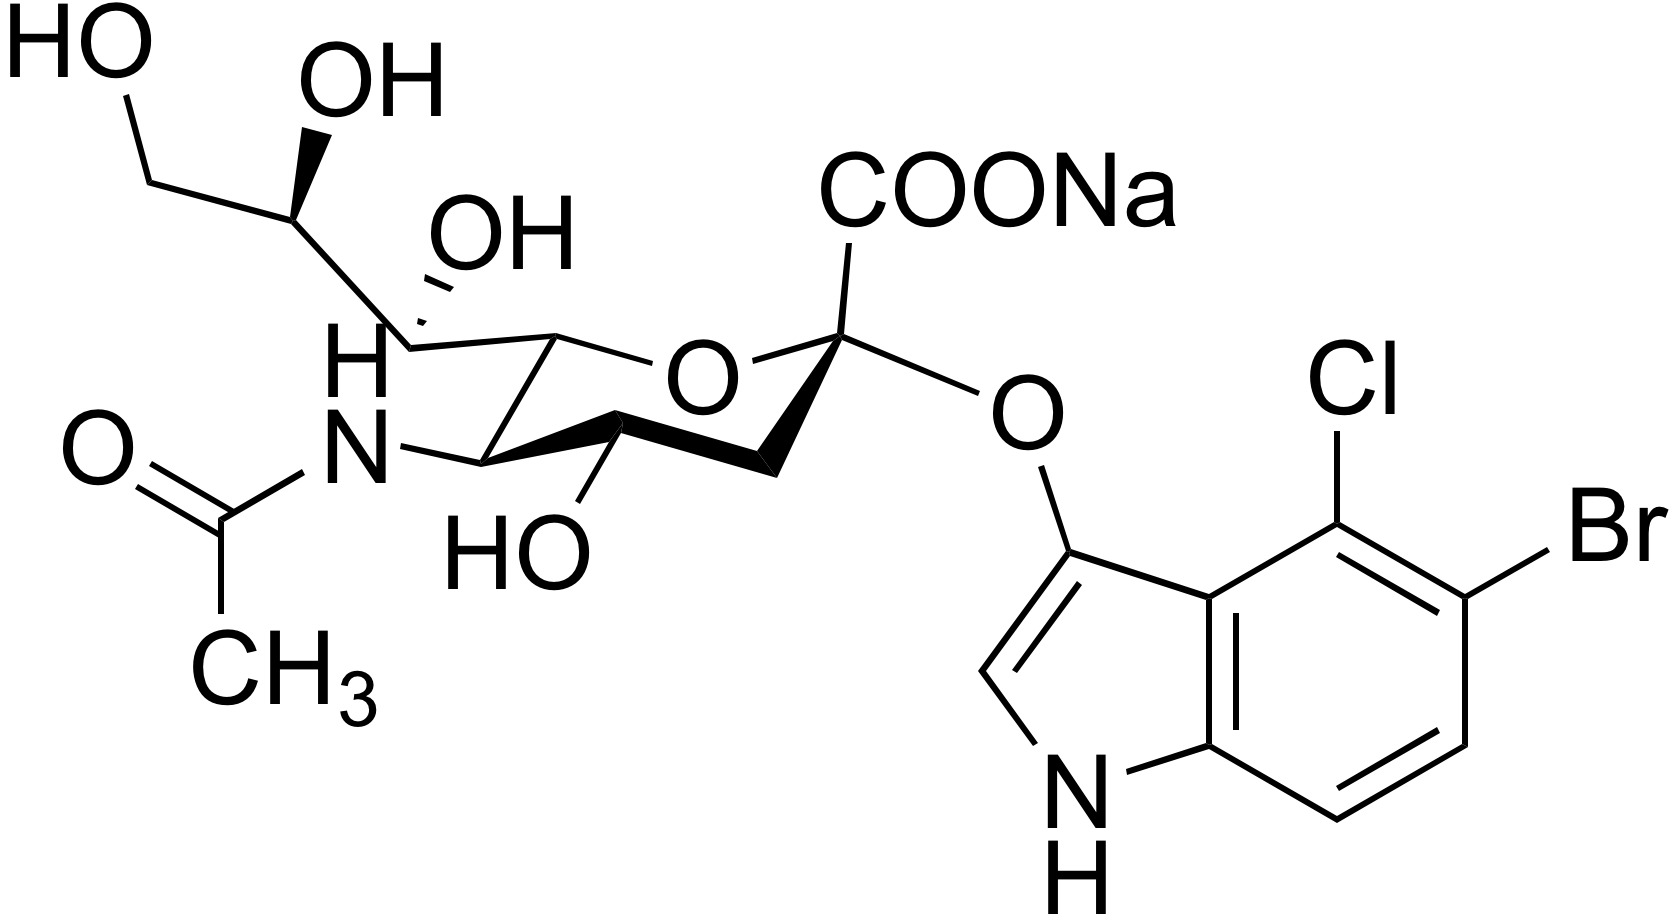 5-Bromo-4-chloro-3-indolyl α-D-N-acetylneuraminic acid sodium salt